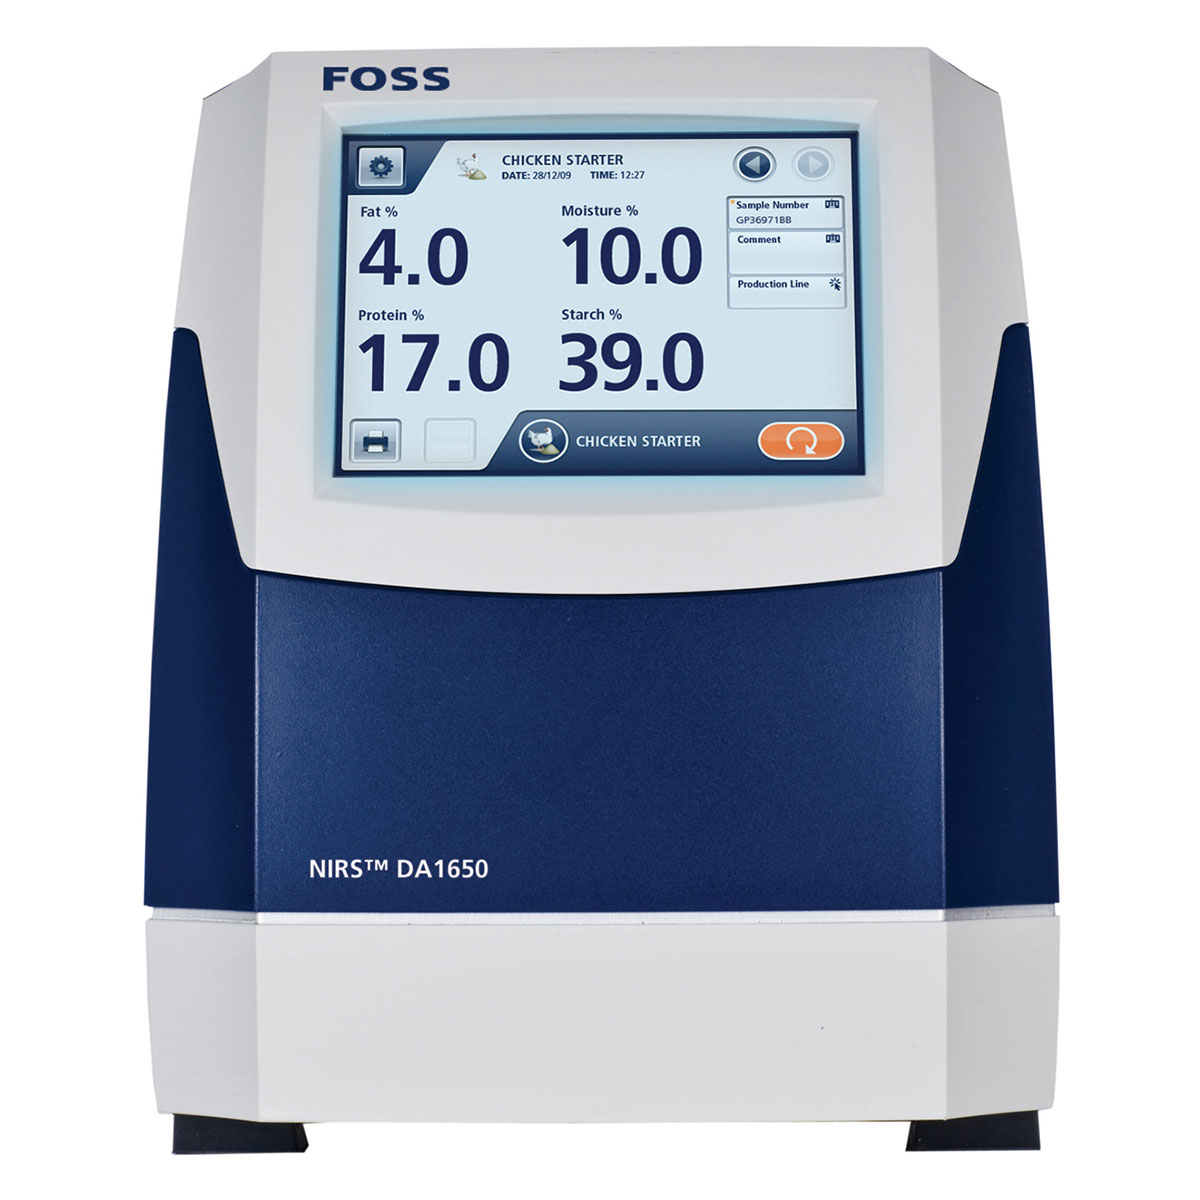 FOSS NIRS DA1650   Yem Analiz Cihazı   Tekafos